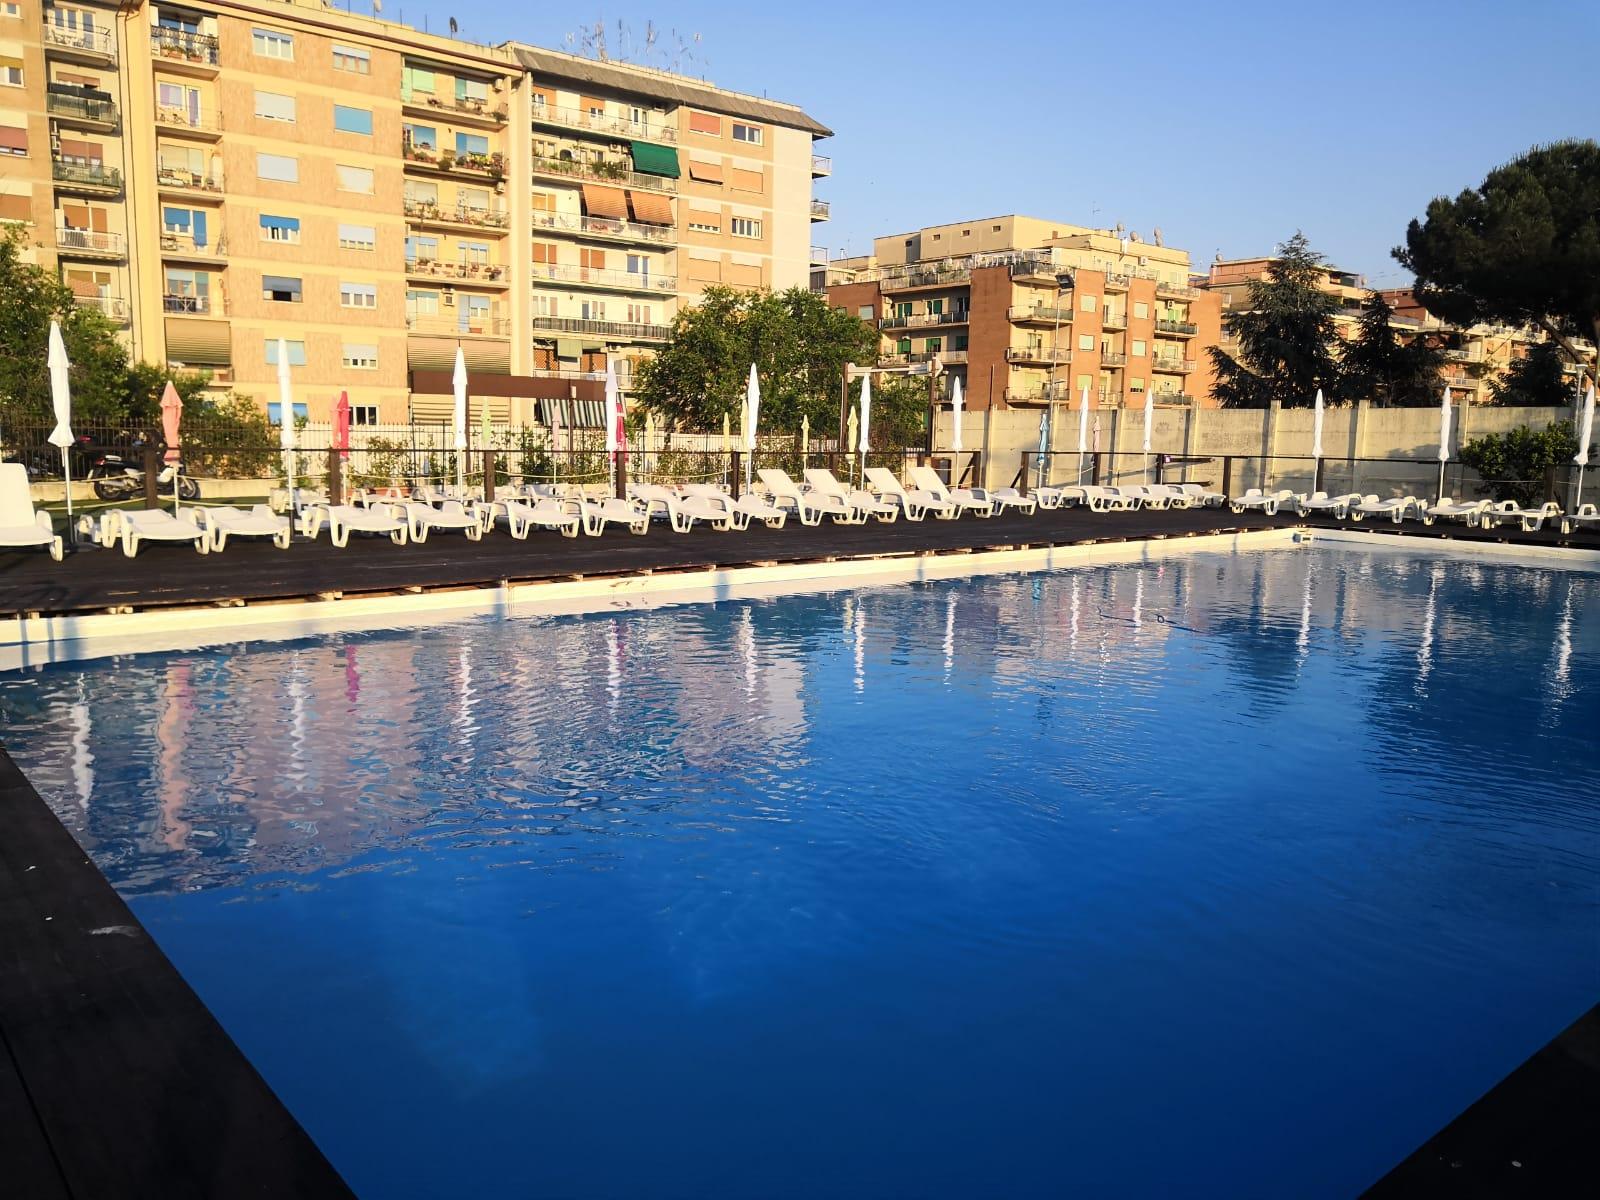 centocellefc piscina 2019 - 14